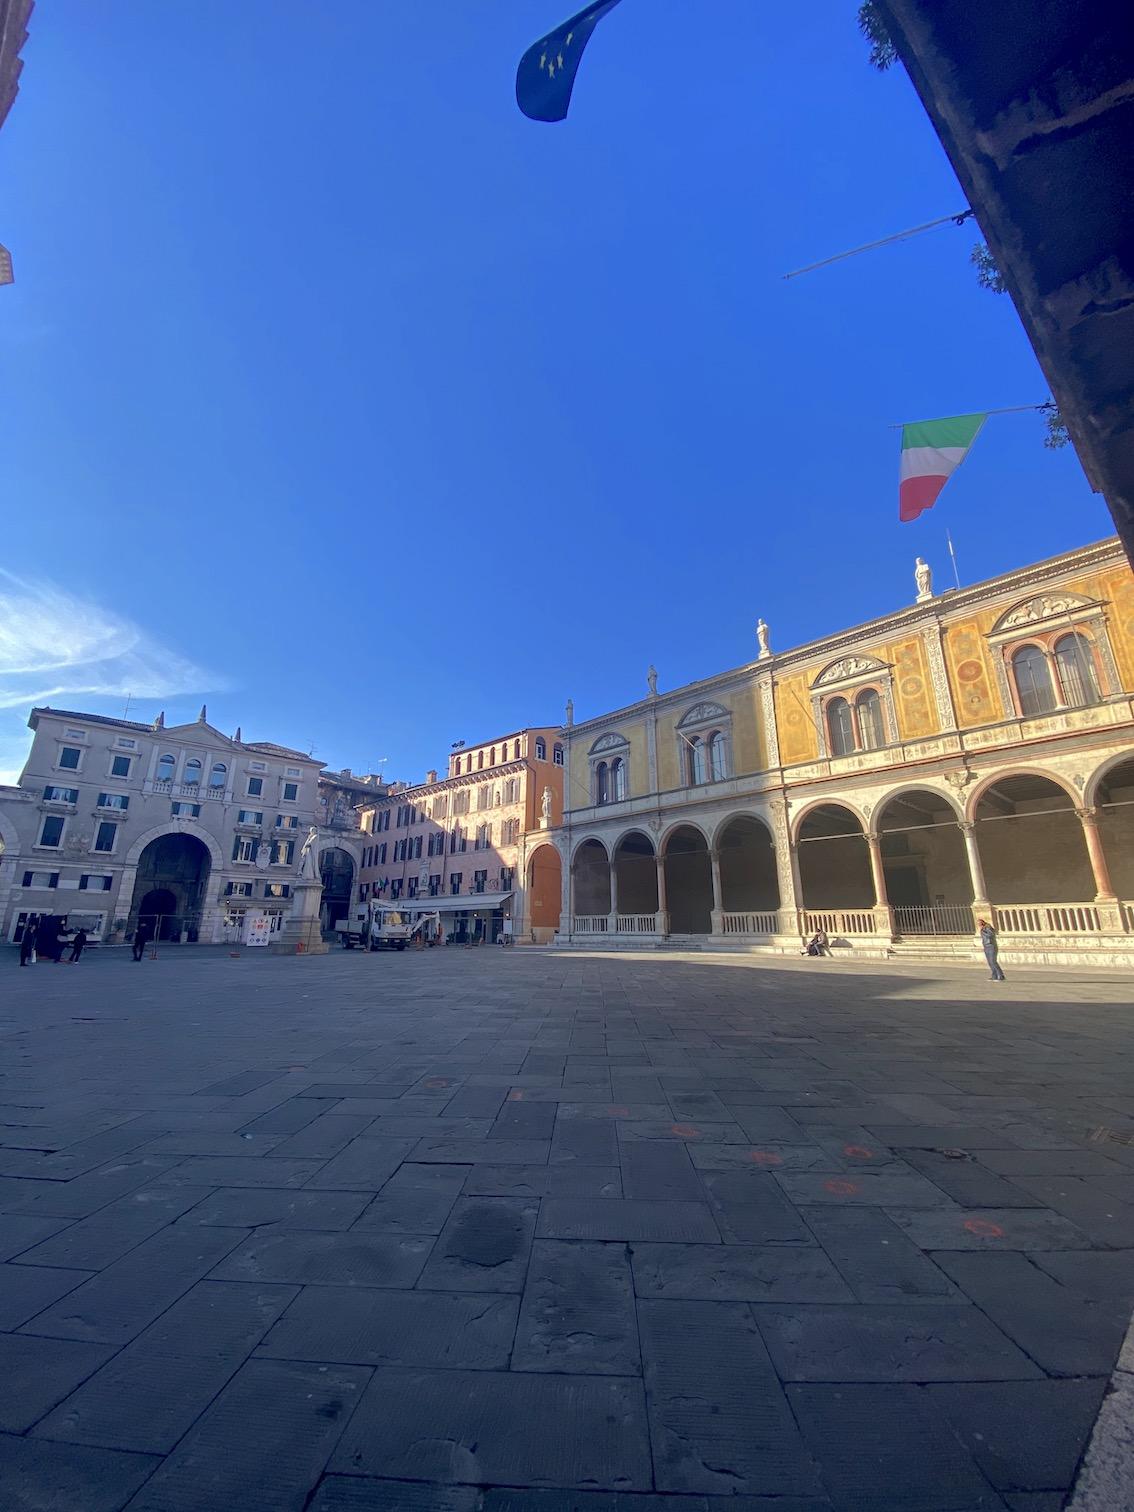 Piazza-dante